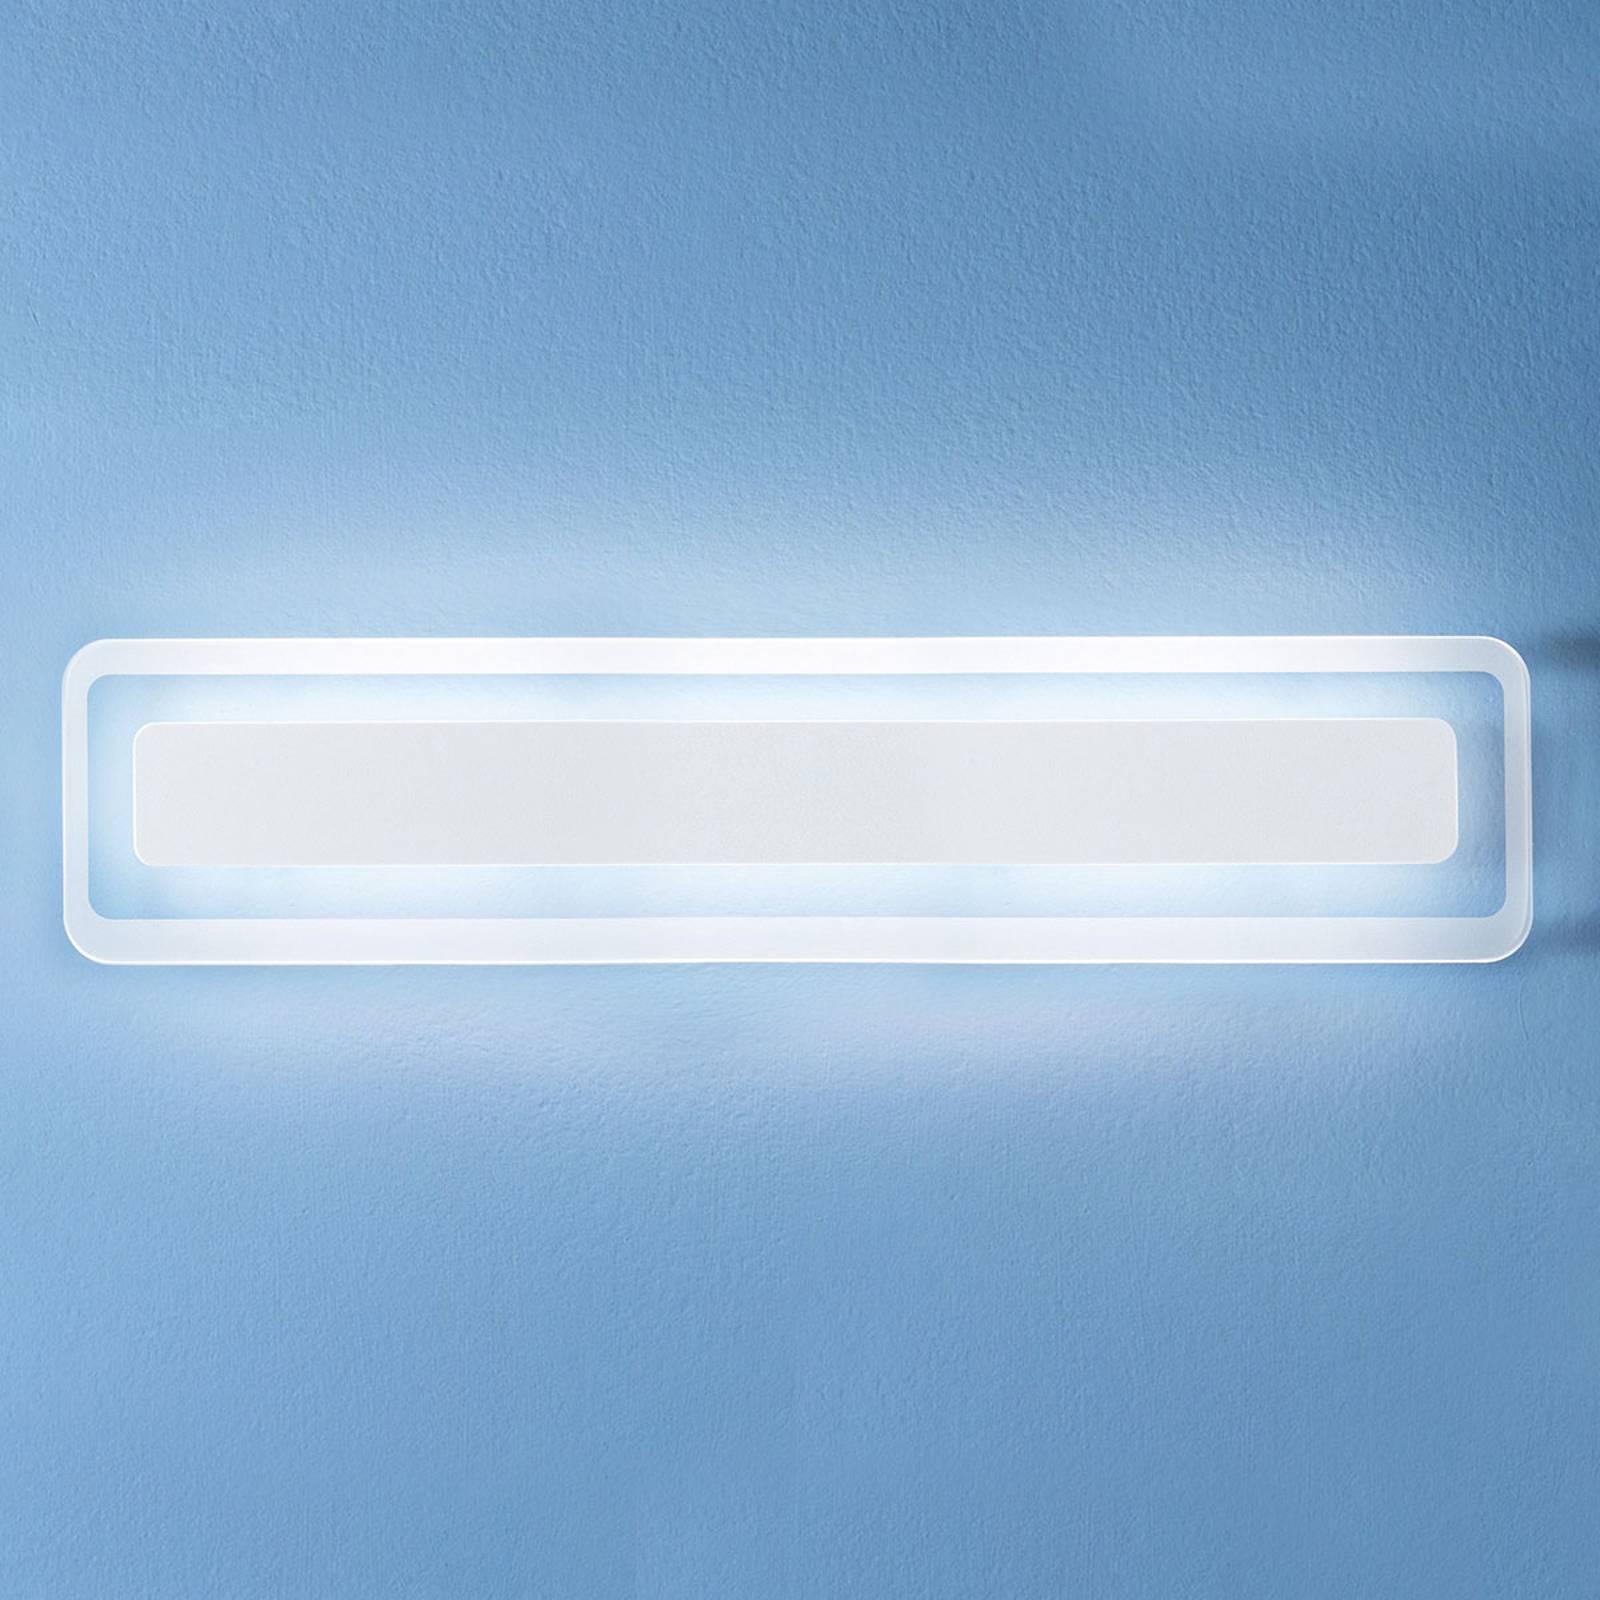 LED wandlamp Antille wit 61,4 cm